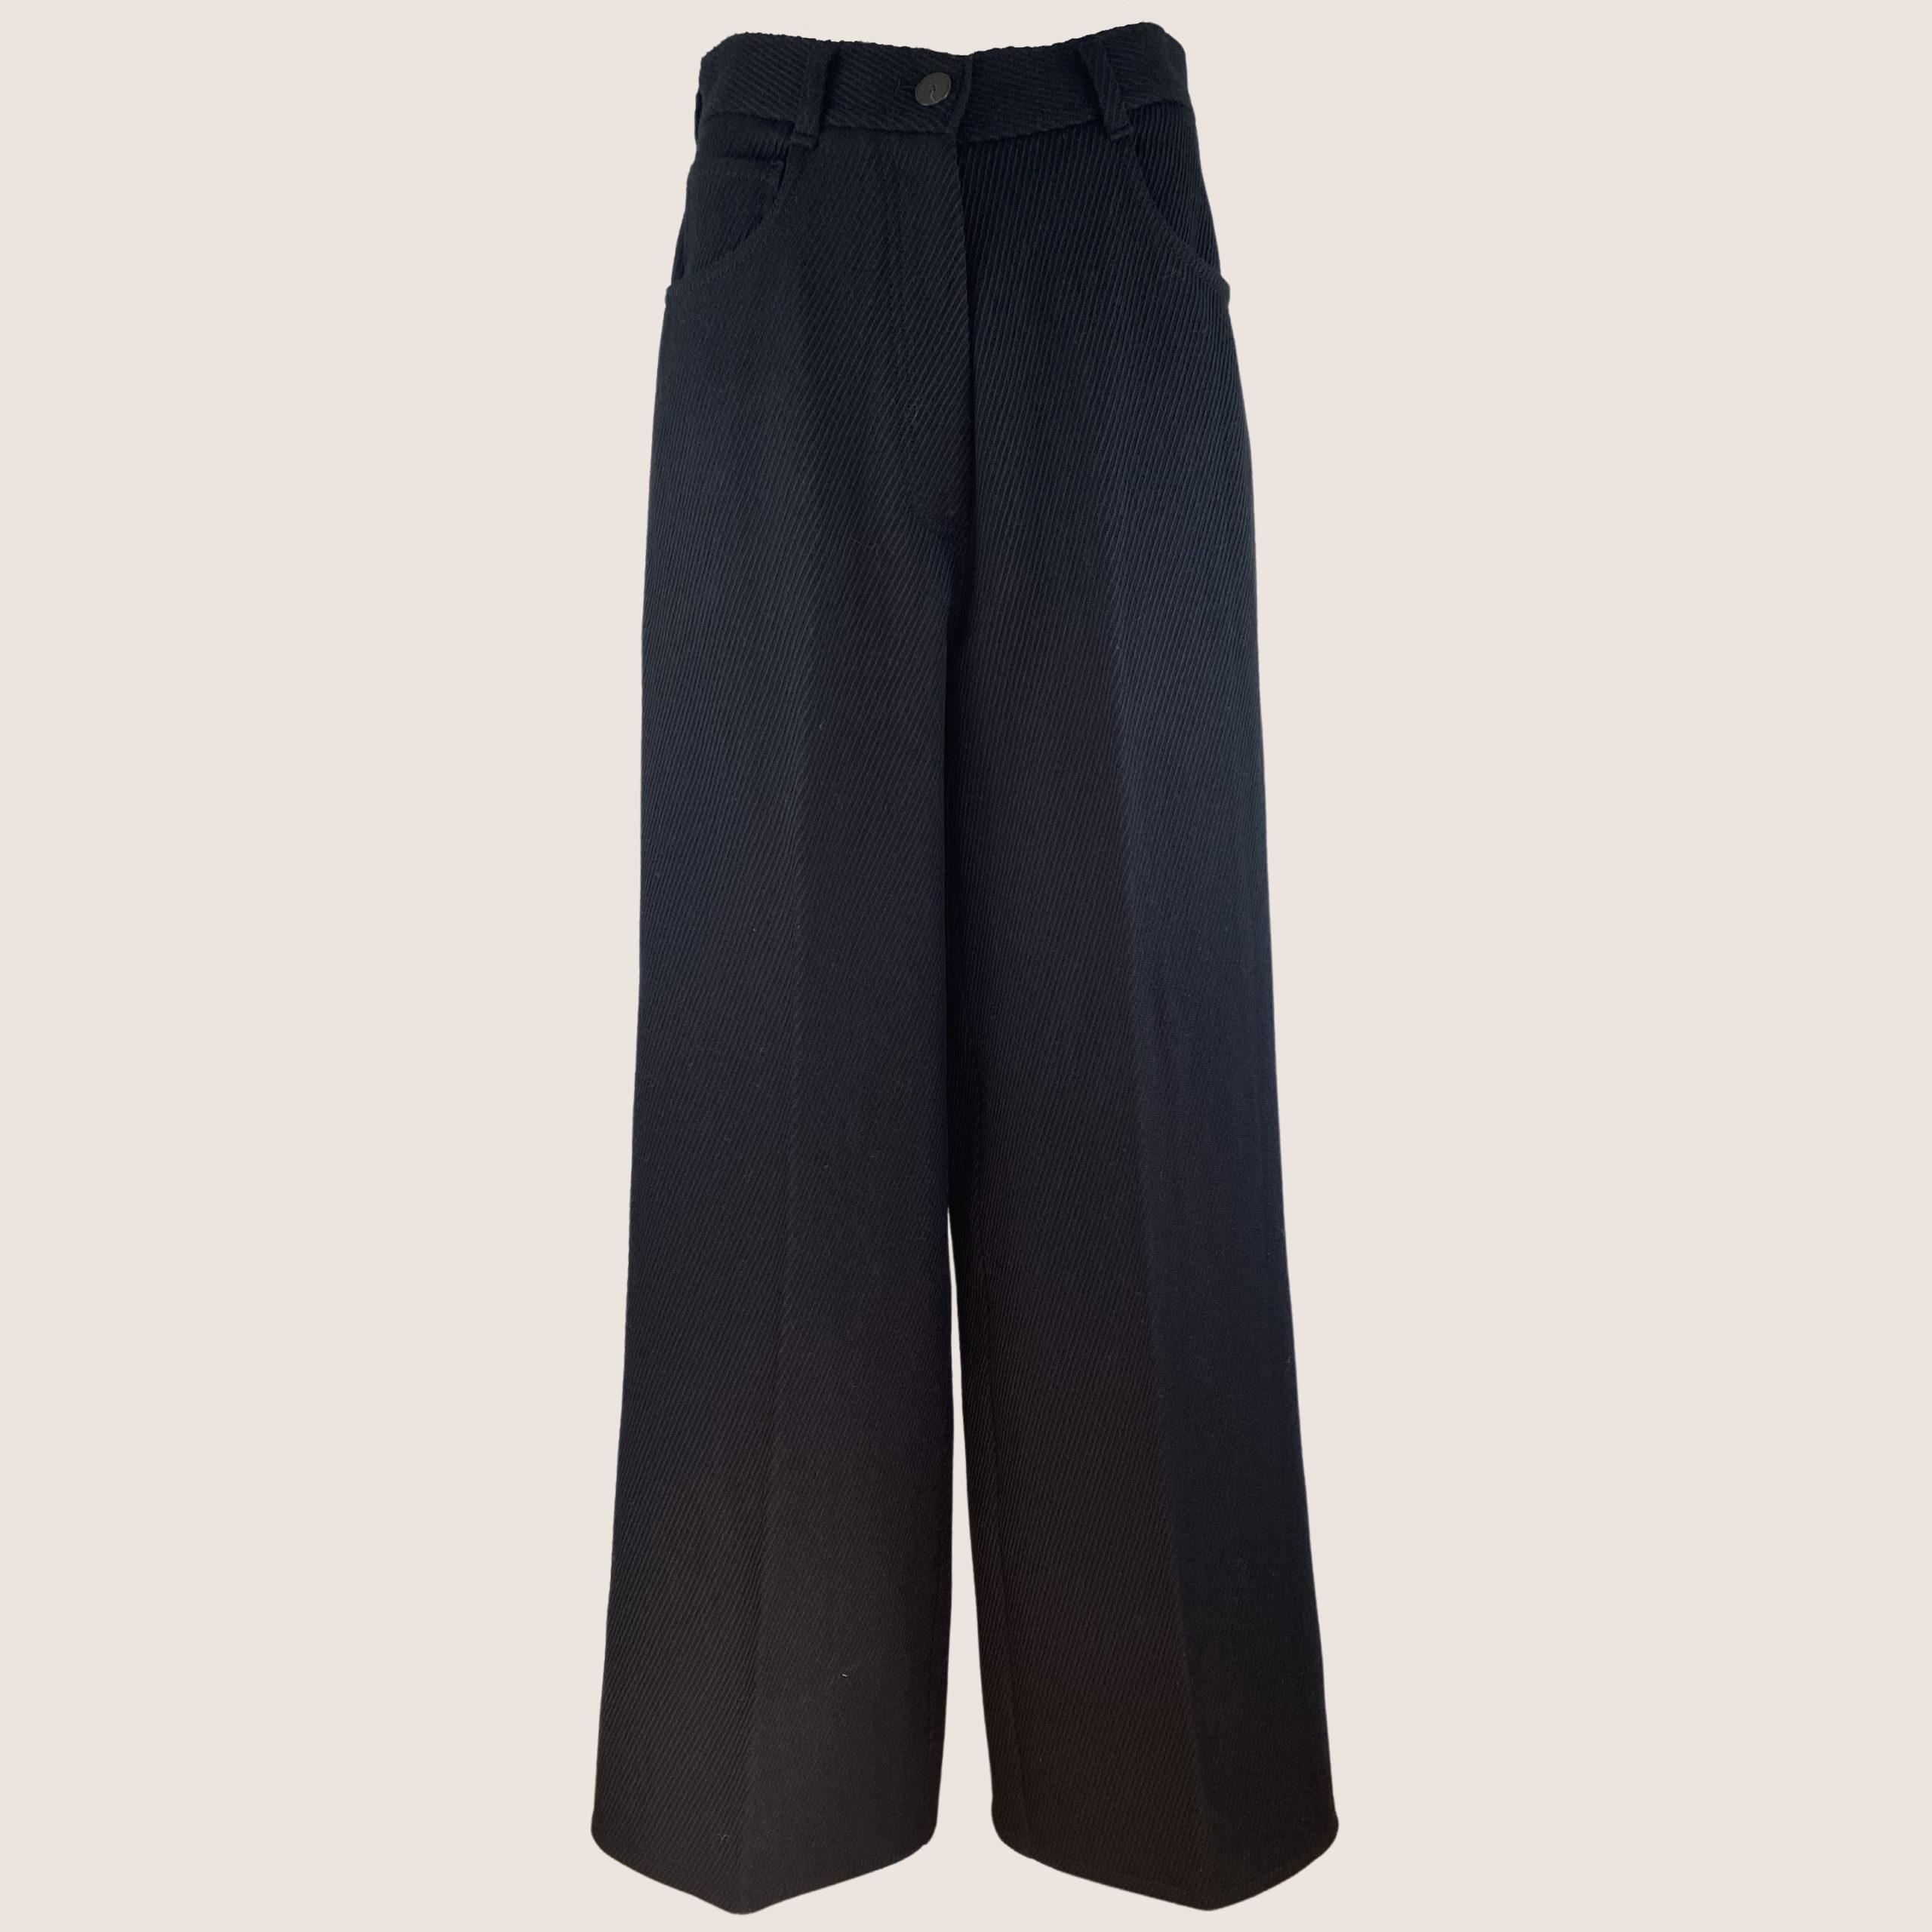 Five Pockets Pants